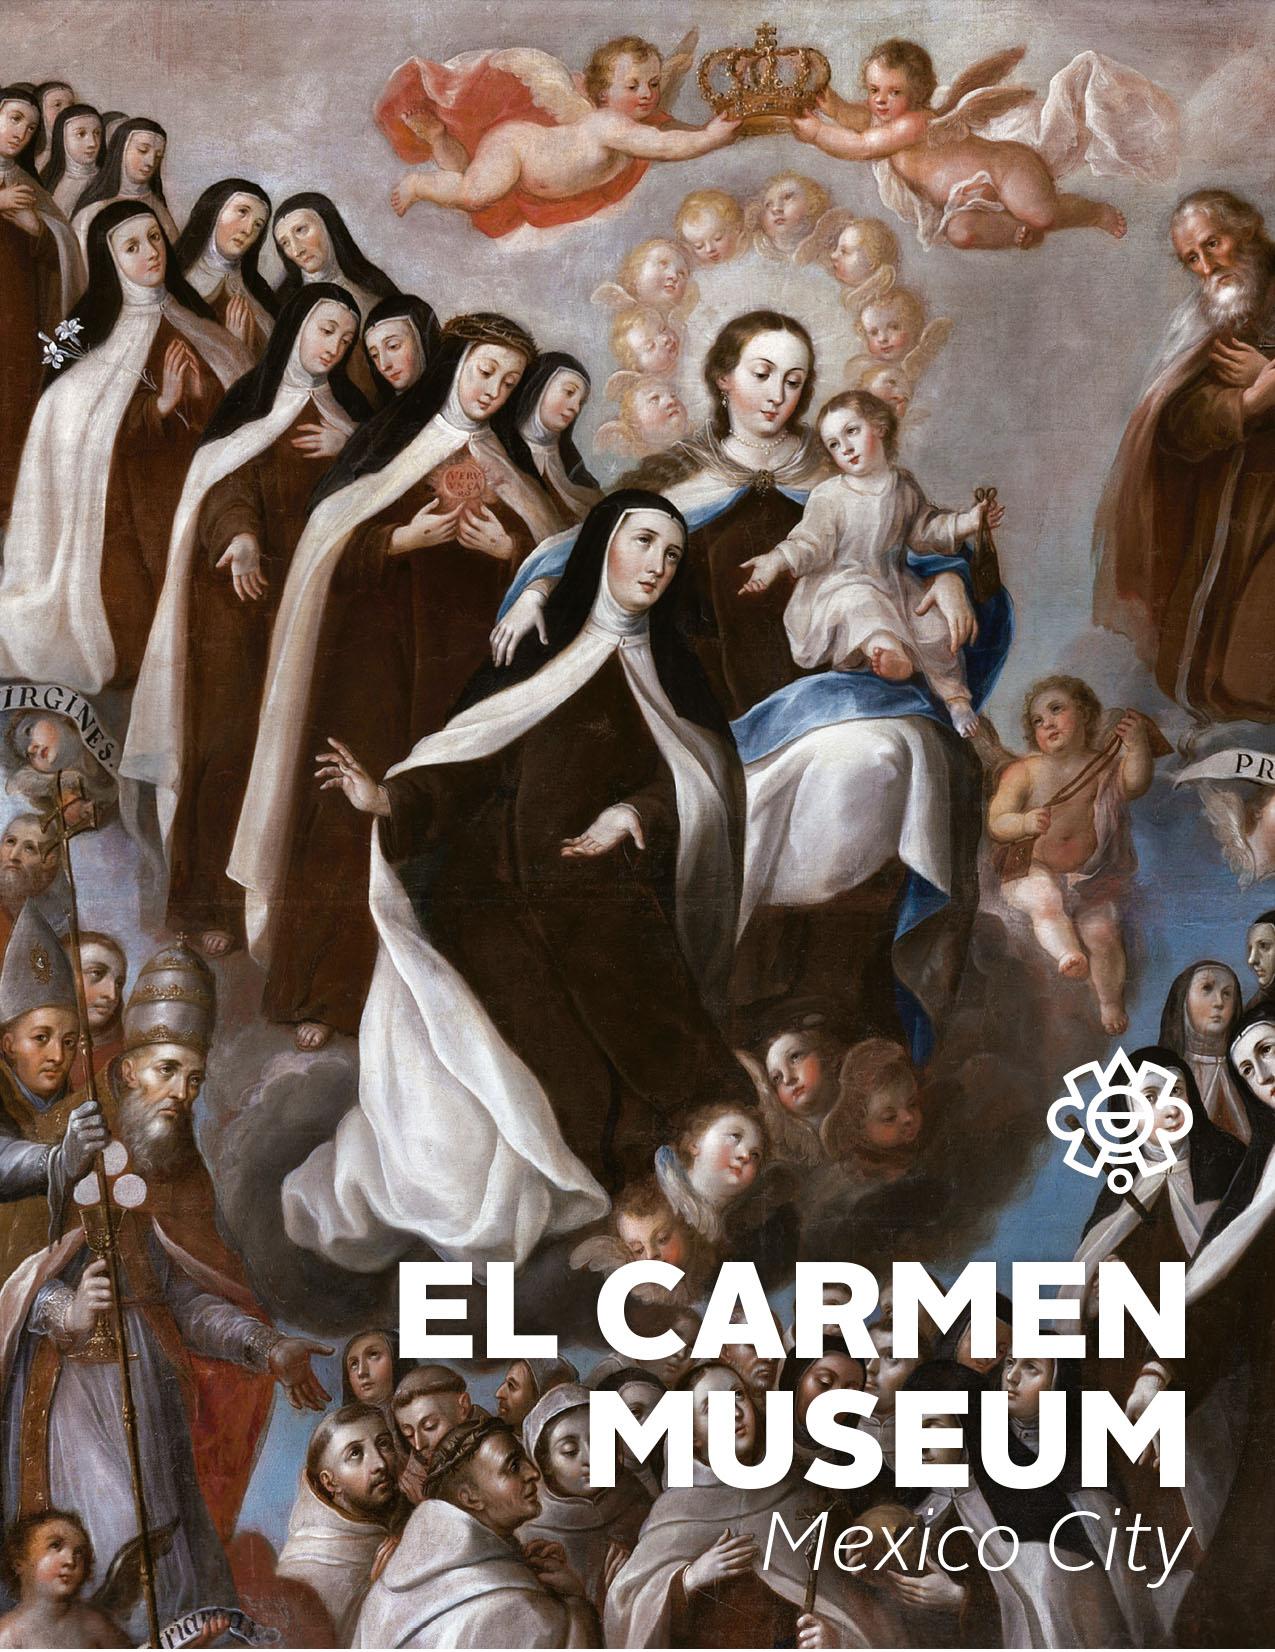 El Carmen Museum